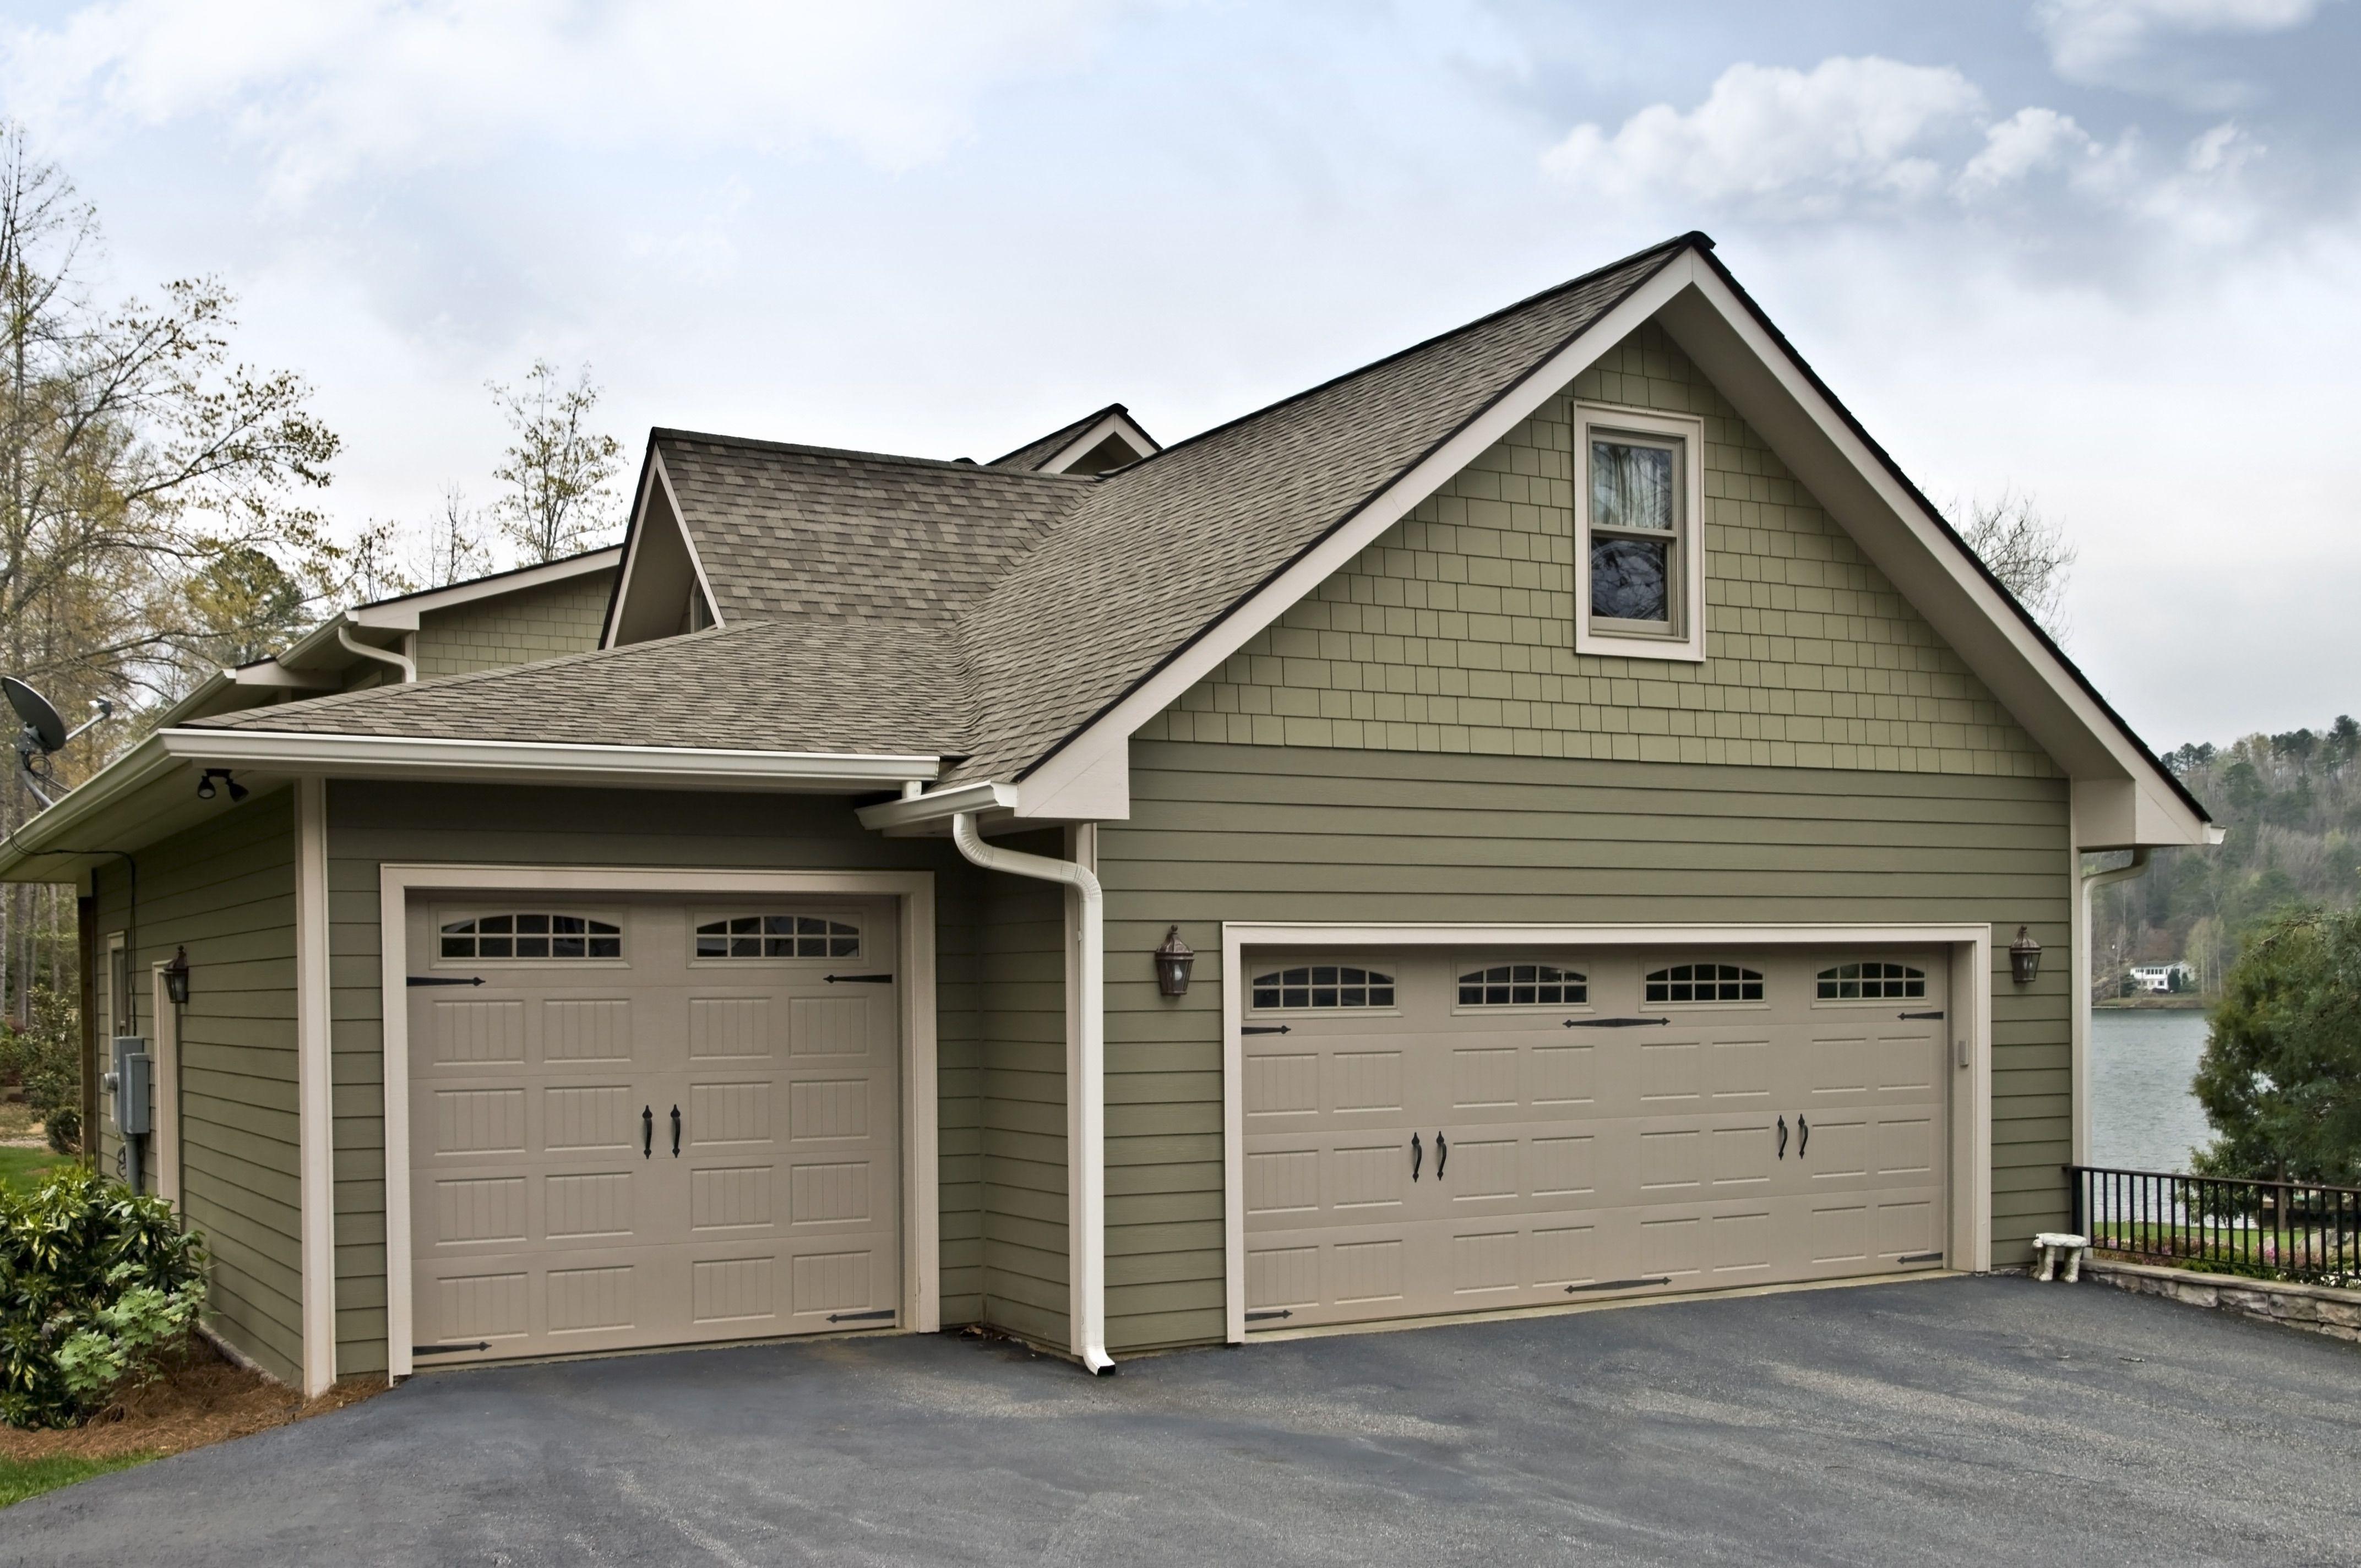 DIY garage door insulation keeps house warm during winter